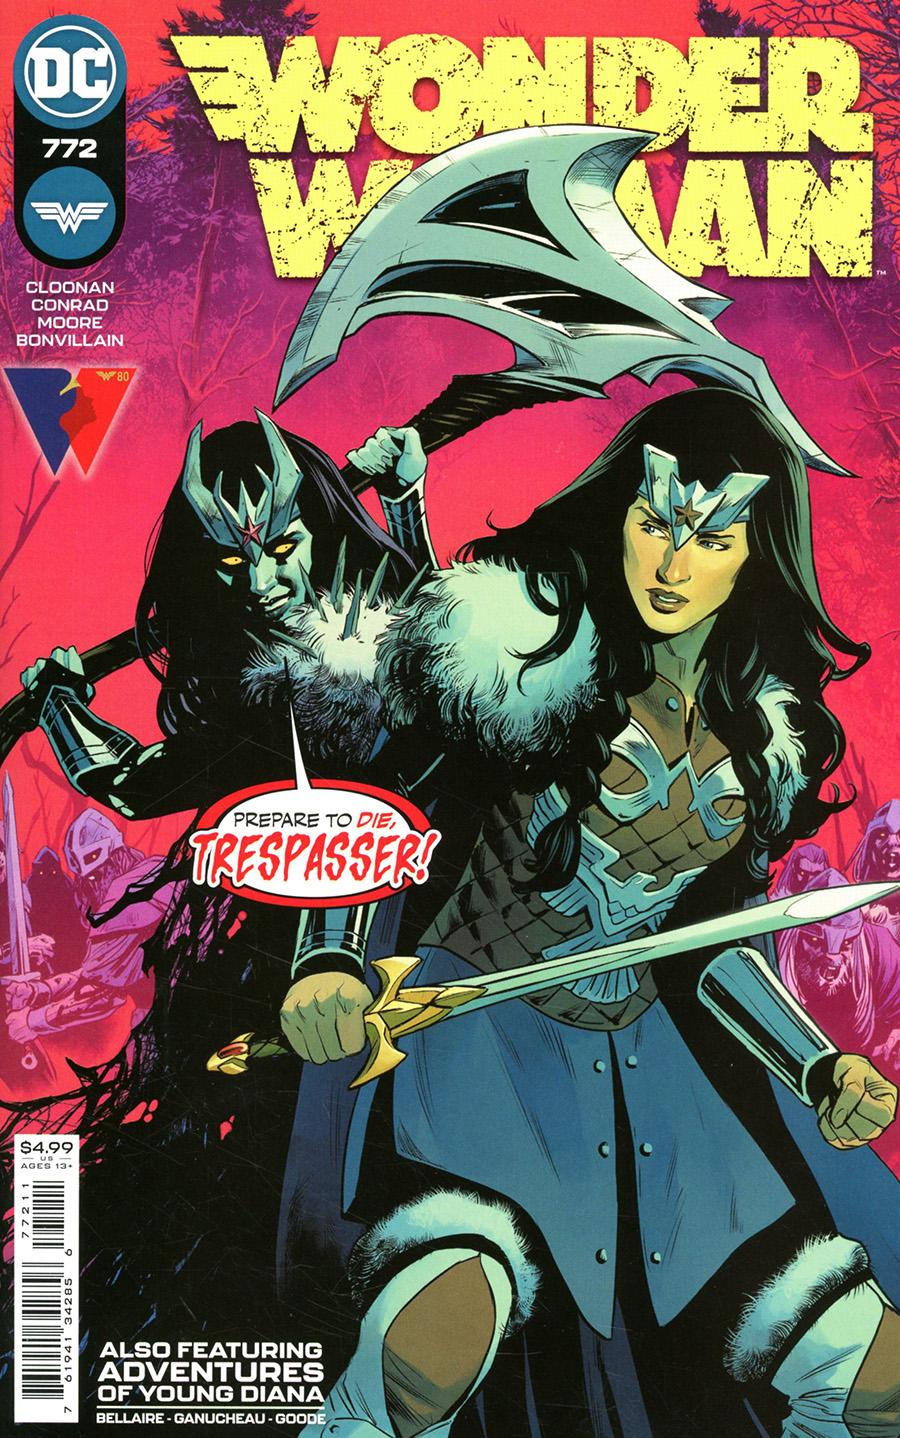 Wonder Woman Vol 5 #772 Cover A Regular Travis Moore Cover